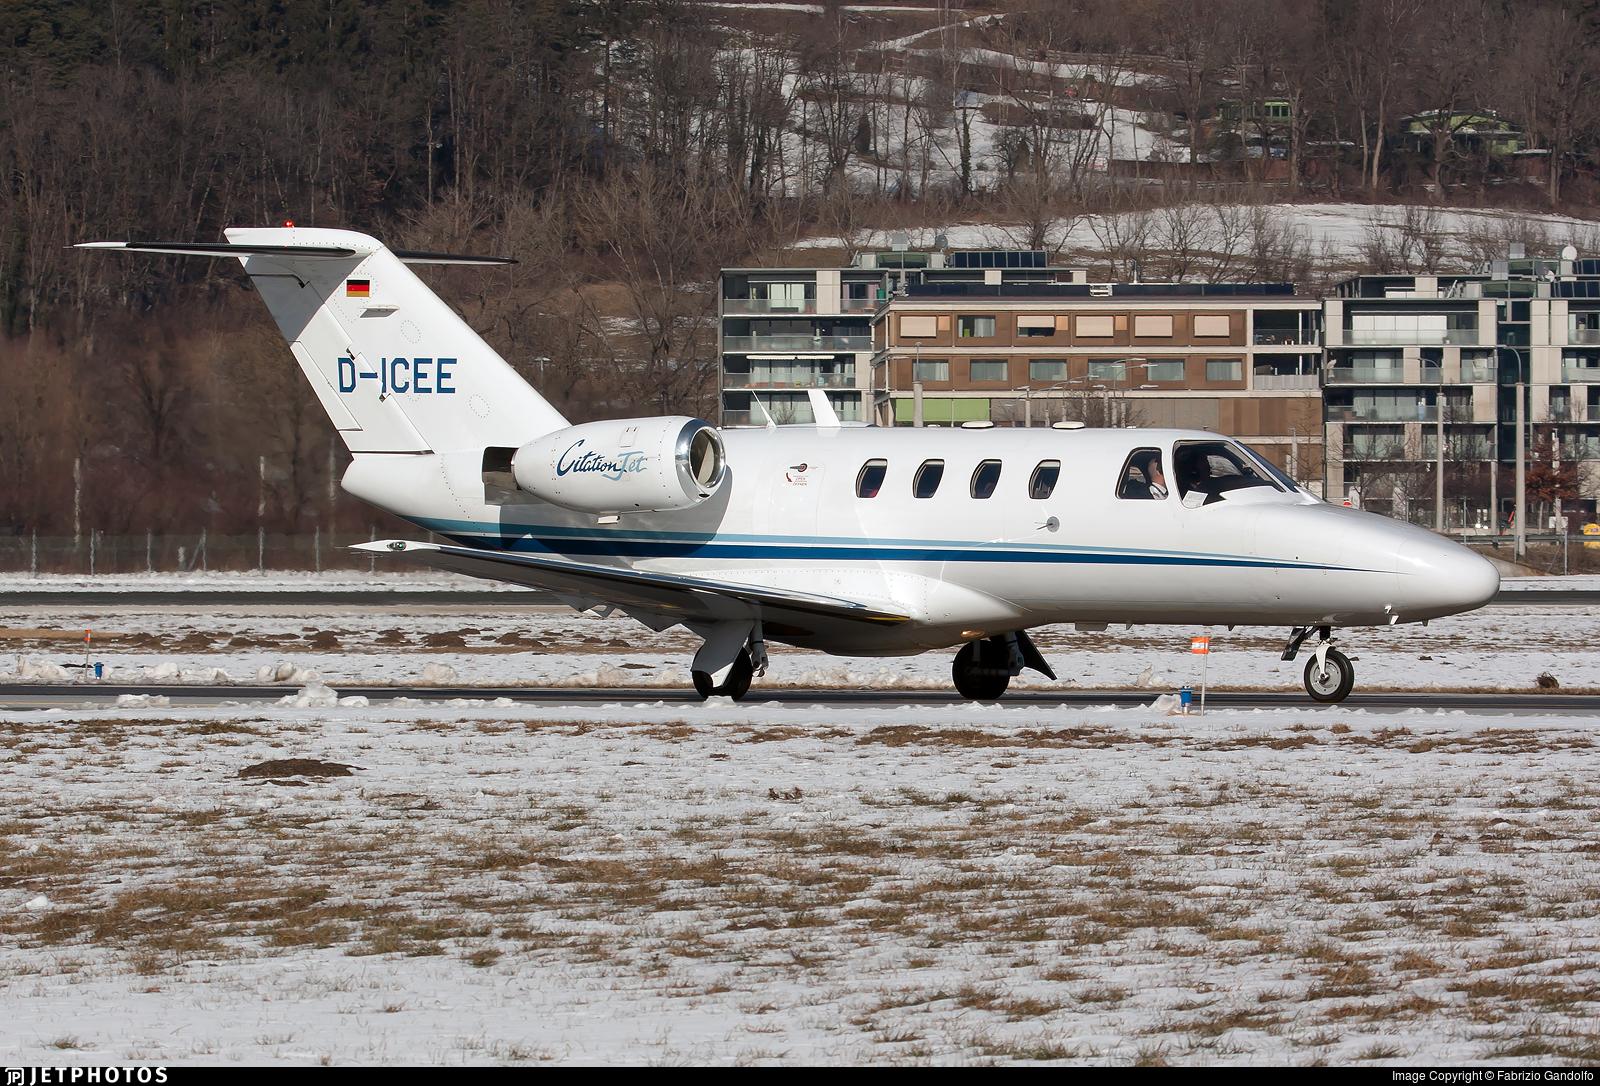 D-ICEE - Cessna 525 CitationJet 1 - E-Aviation